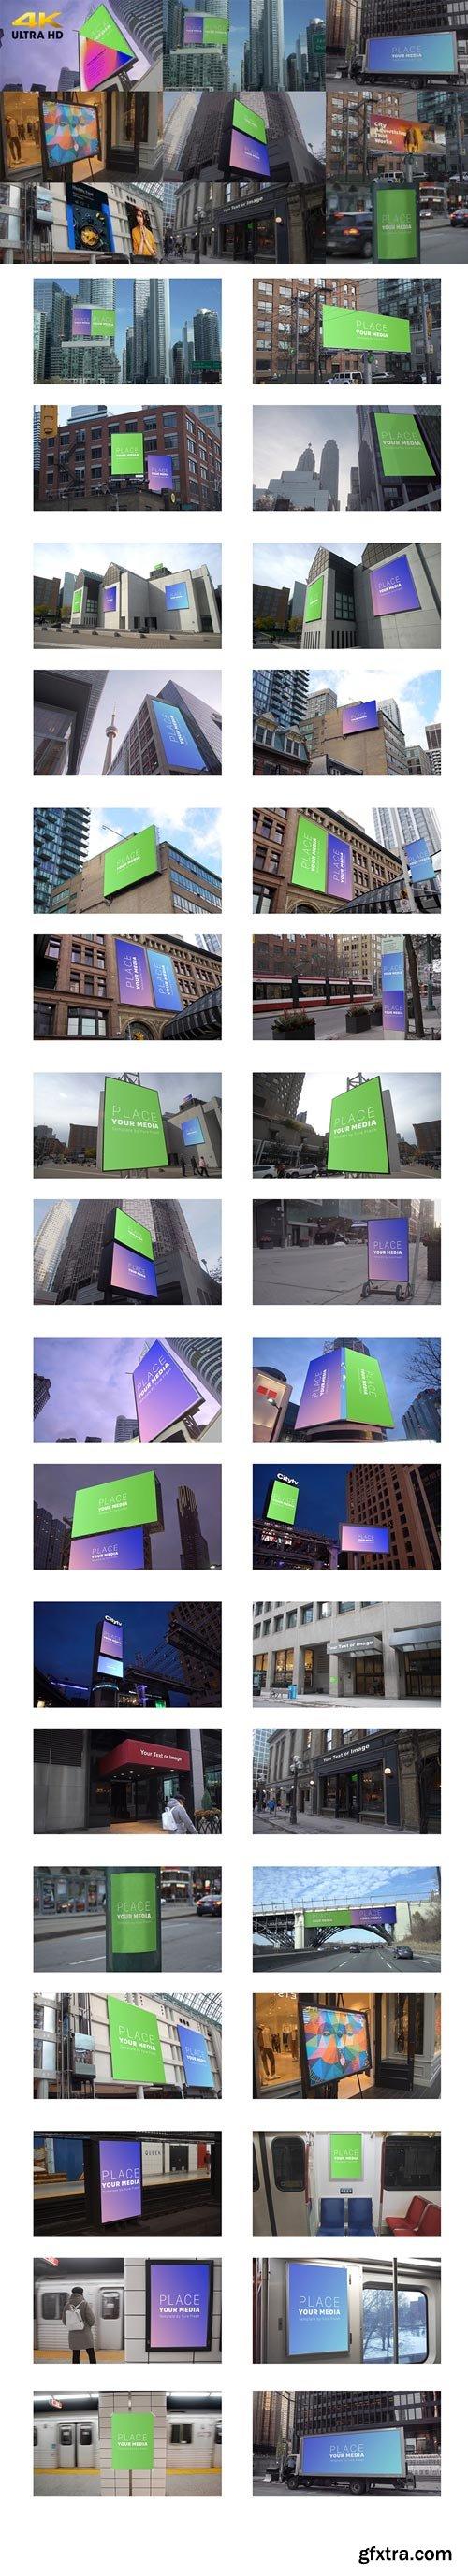 Videohive - City Advertising Mockups - 25782377